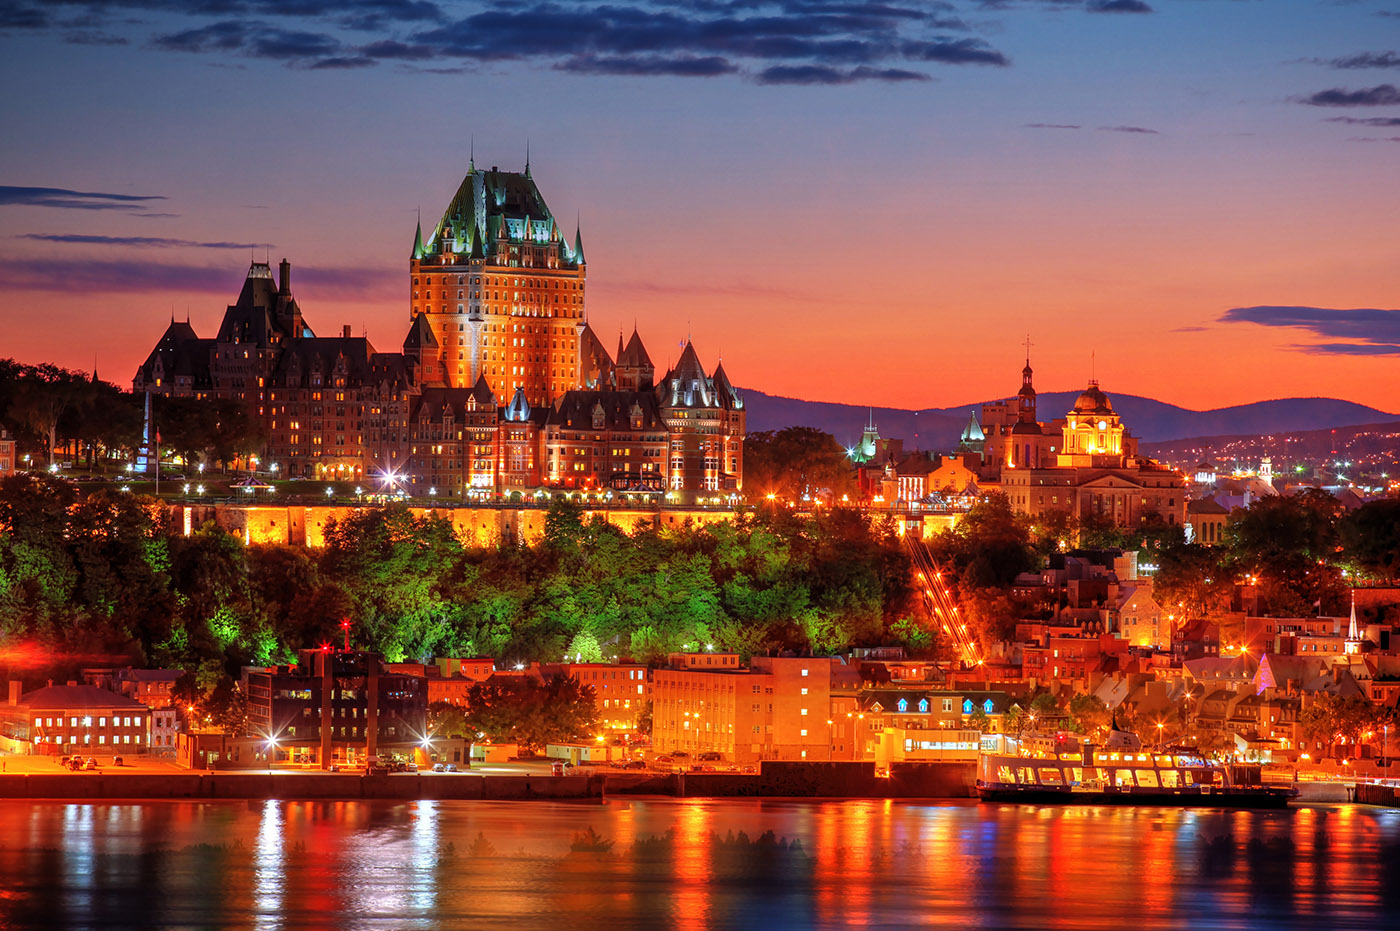 Quebec Frontenac Castle Montage 02 - Stock Photos, Pictures & Images